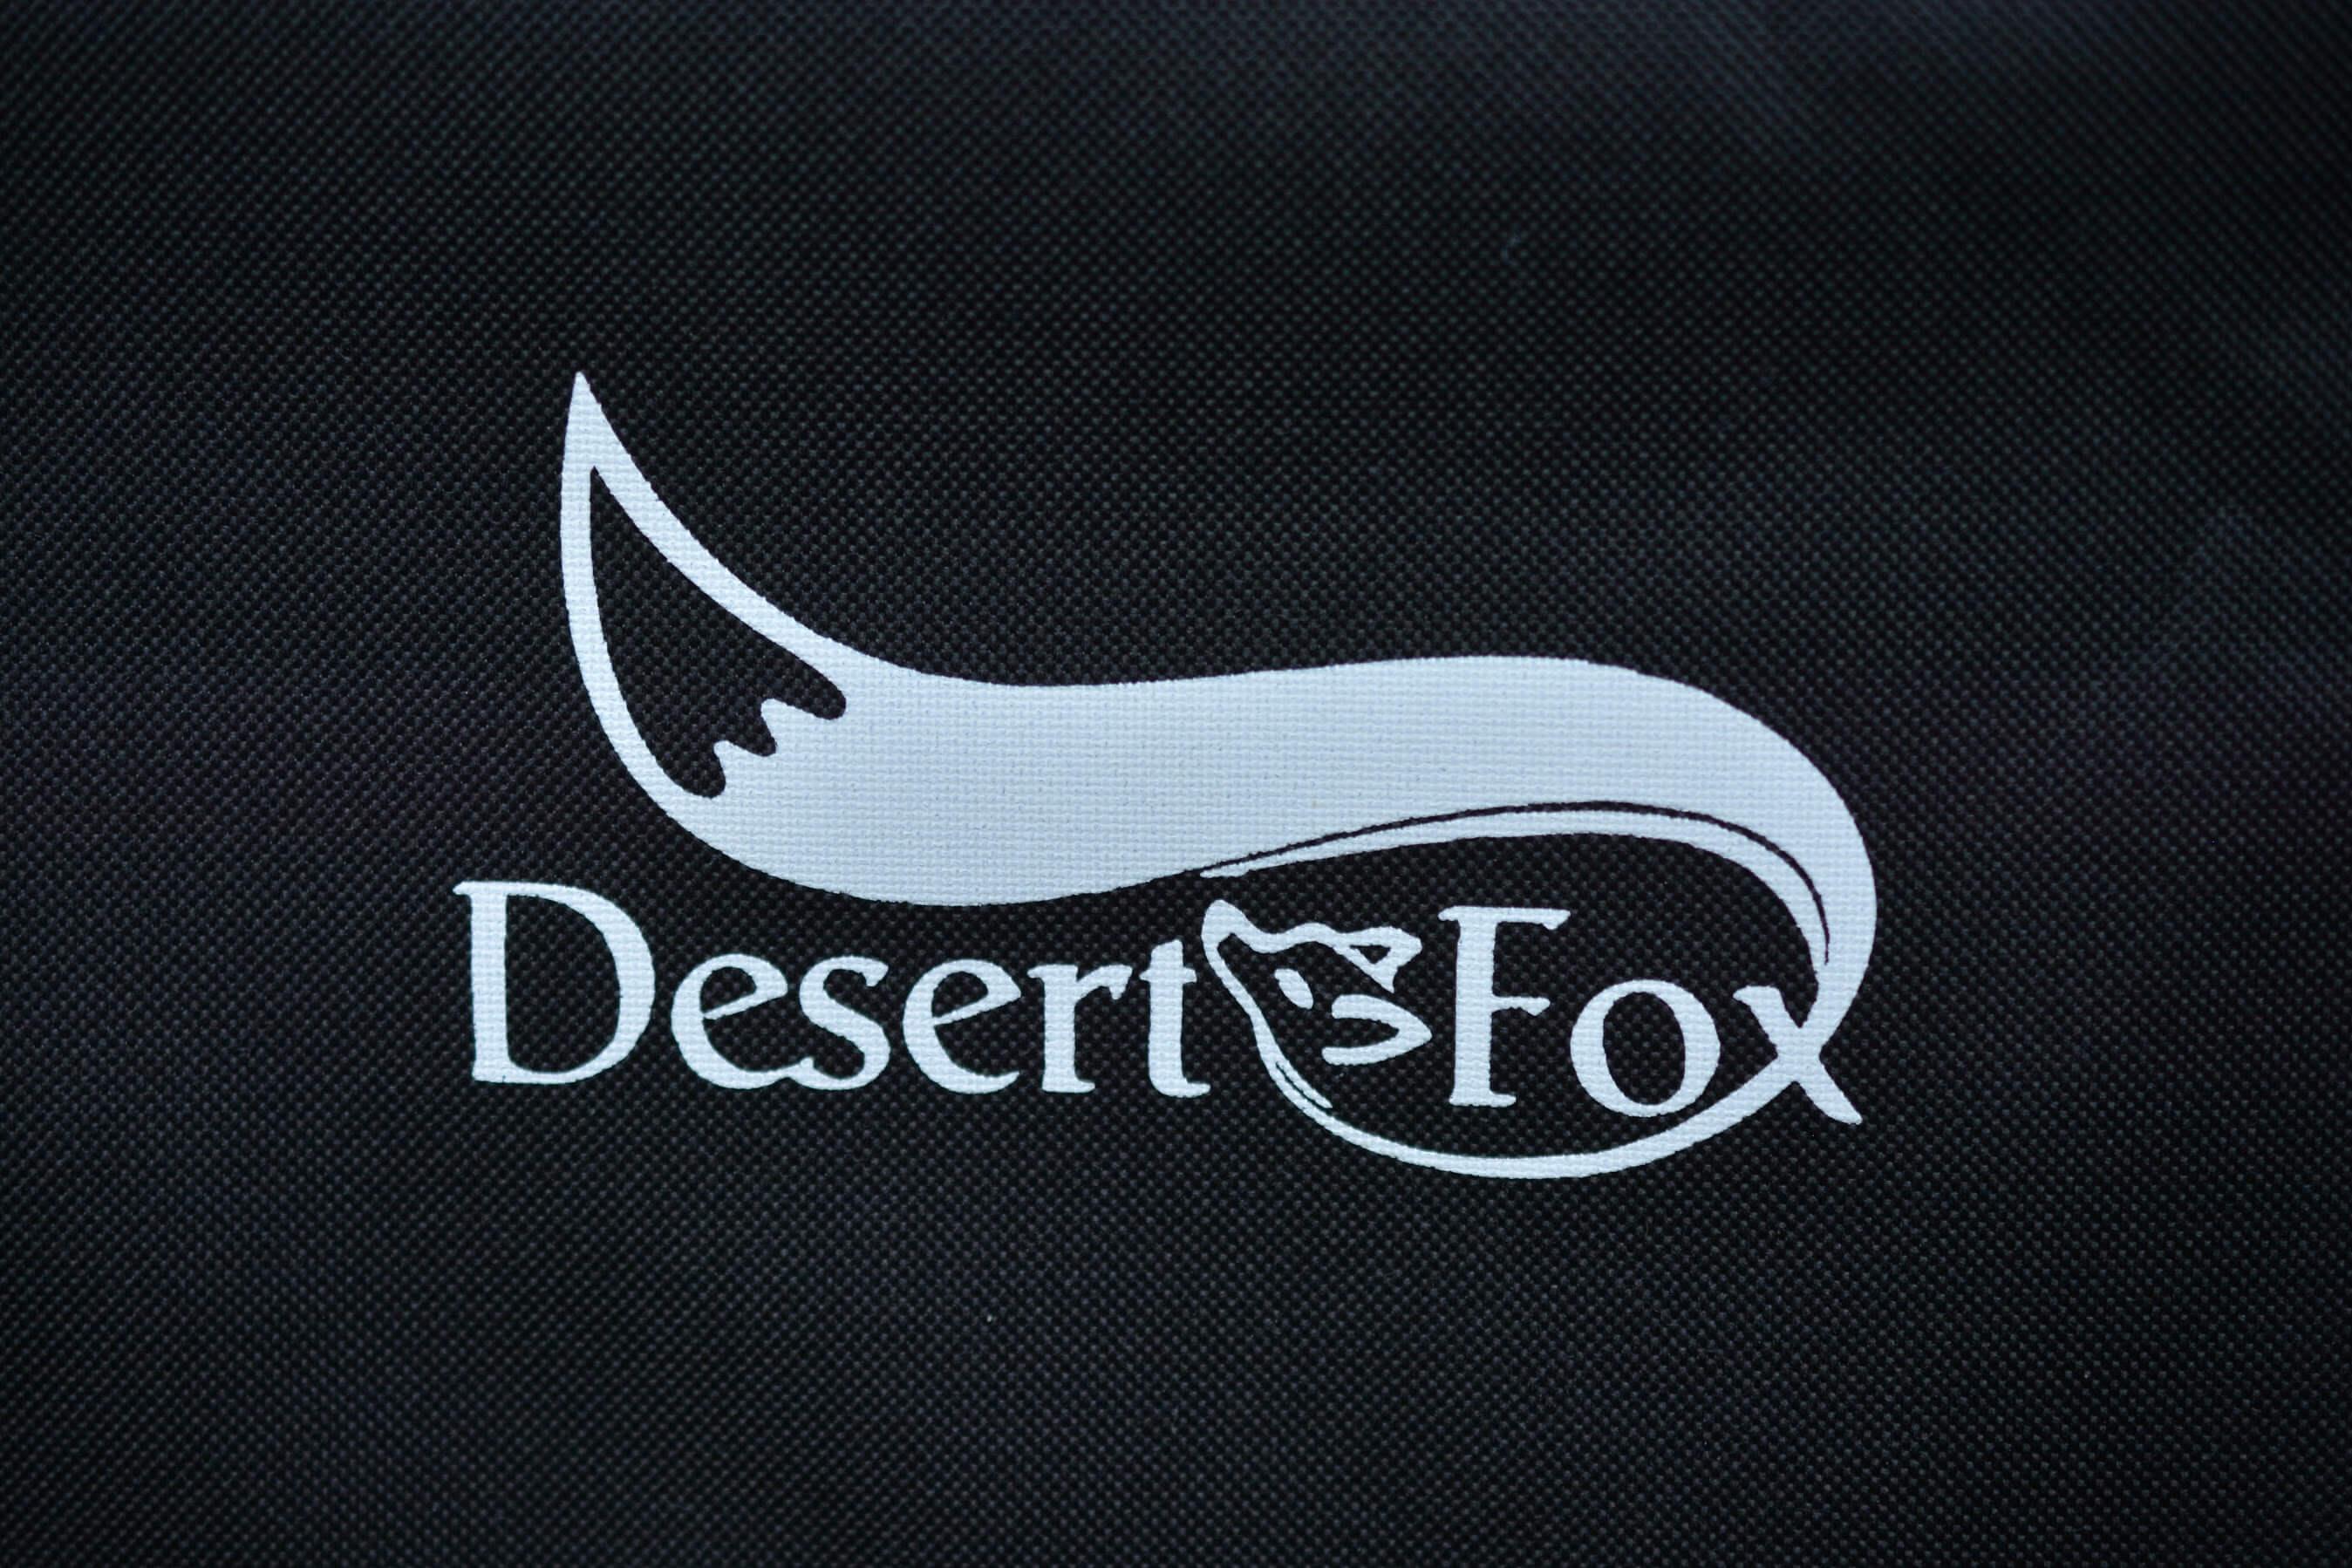 DesertFox アウトドアチェア ロゴ